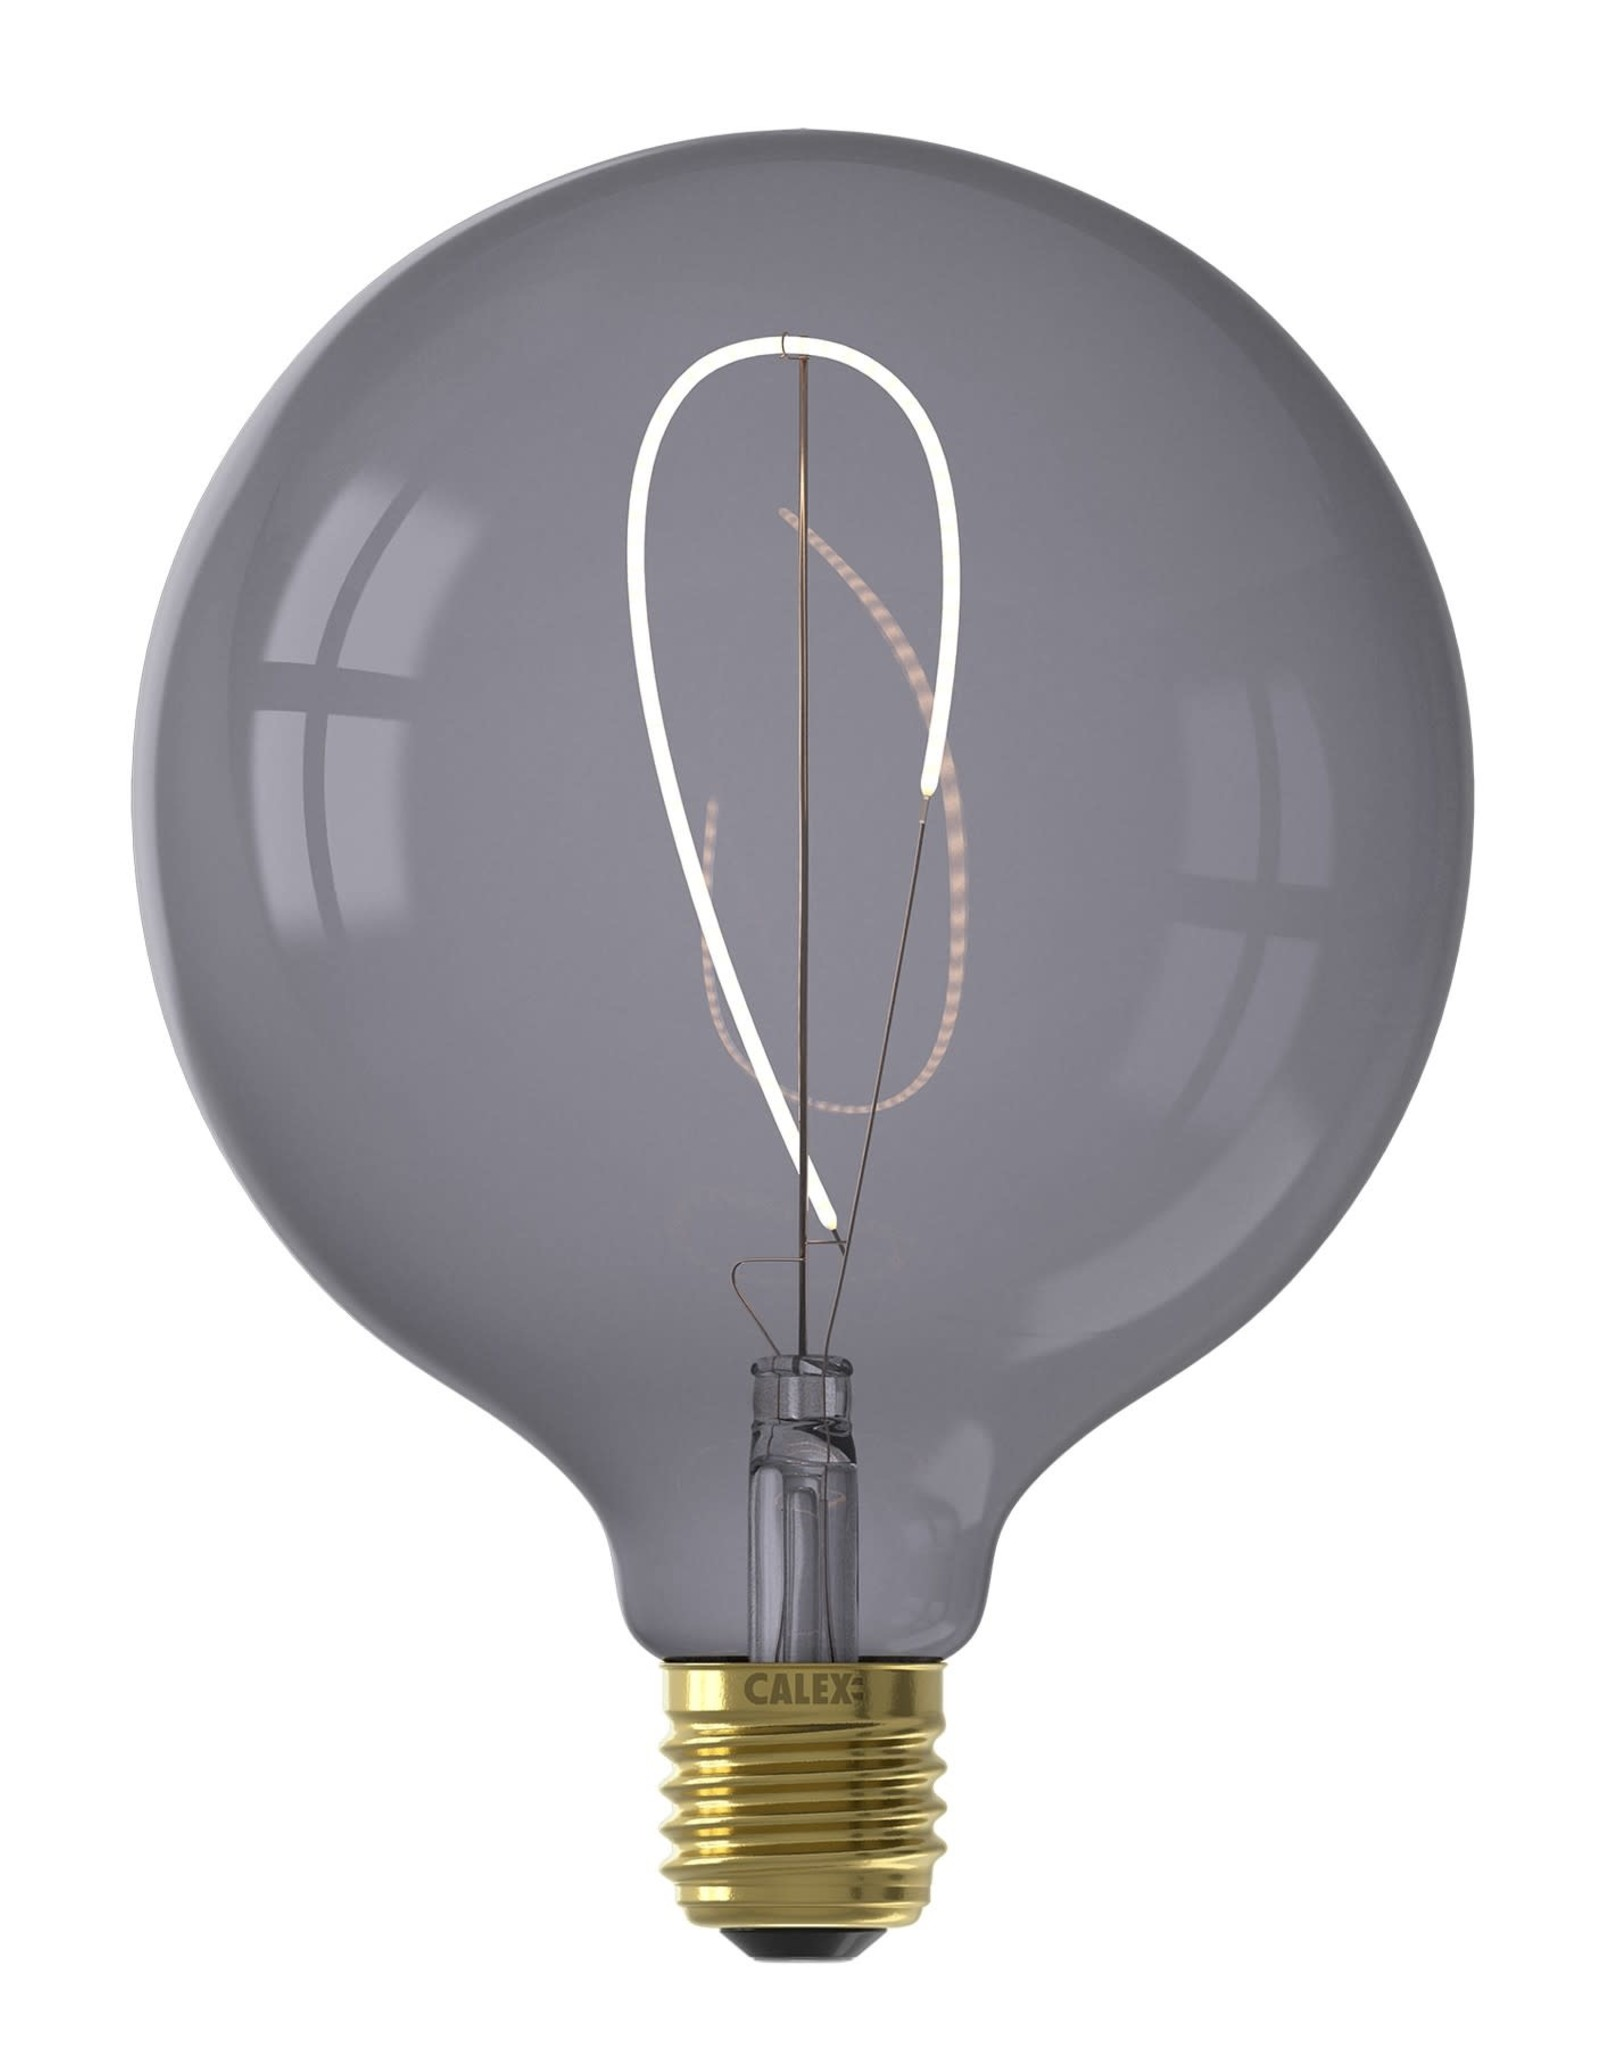 Calex NORA LED colors Globe G125 soft U-filament 220-240V 4W E27, Topaz Grey 2200K dimmable, energy label B